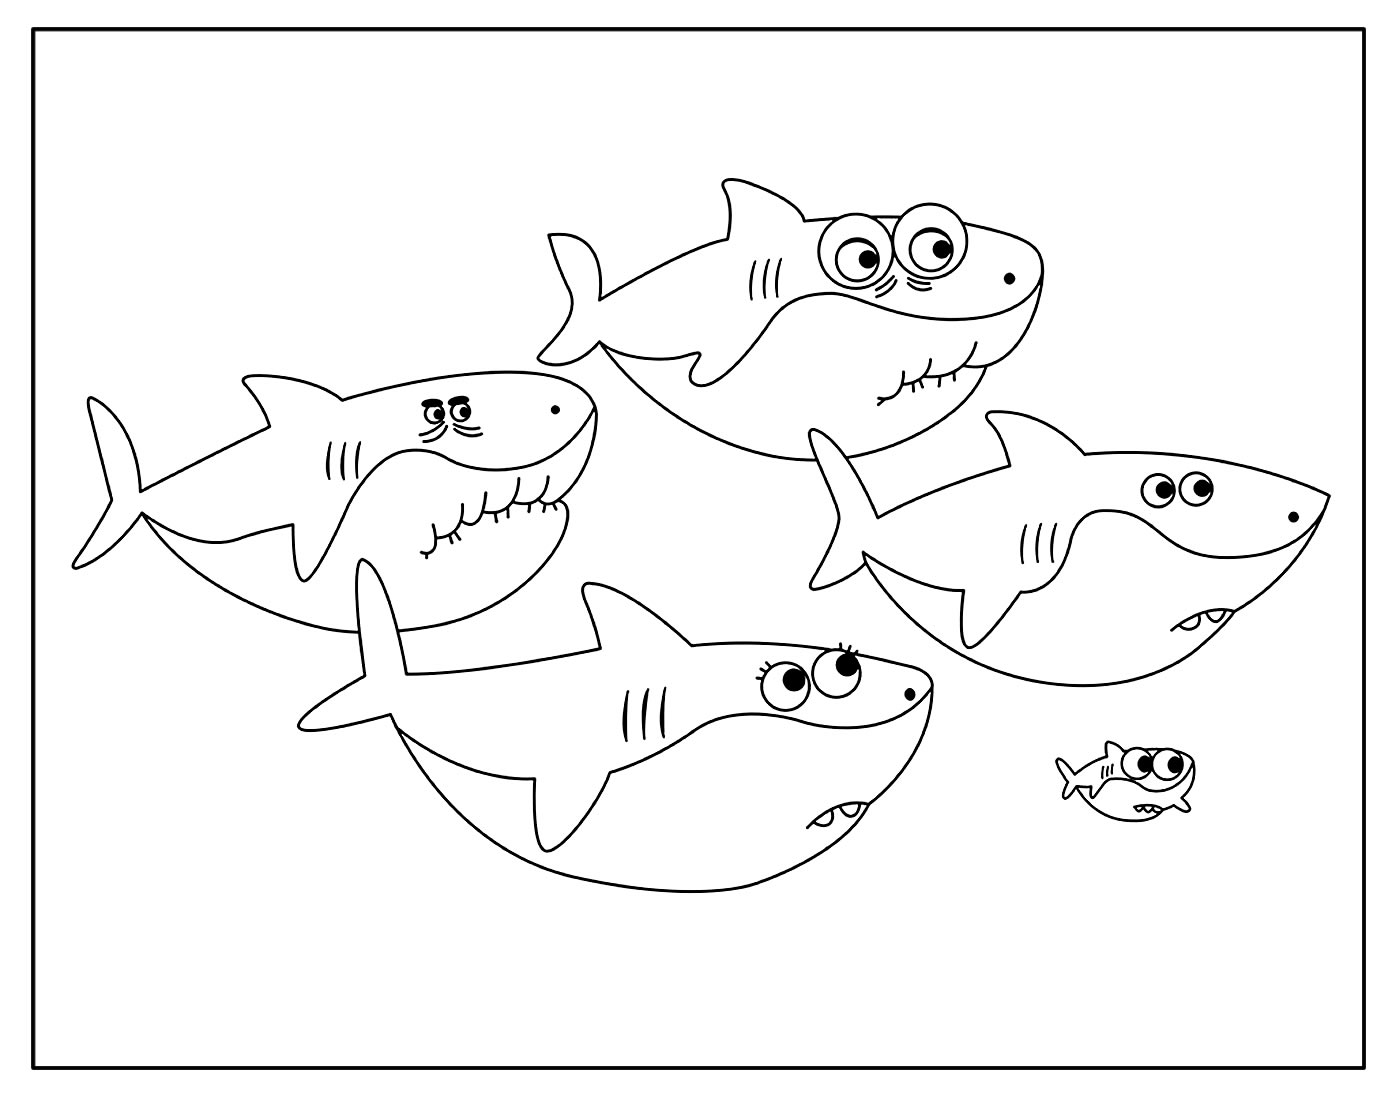 Página para colorir do Baby Shark